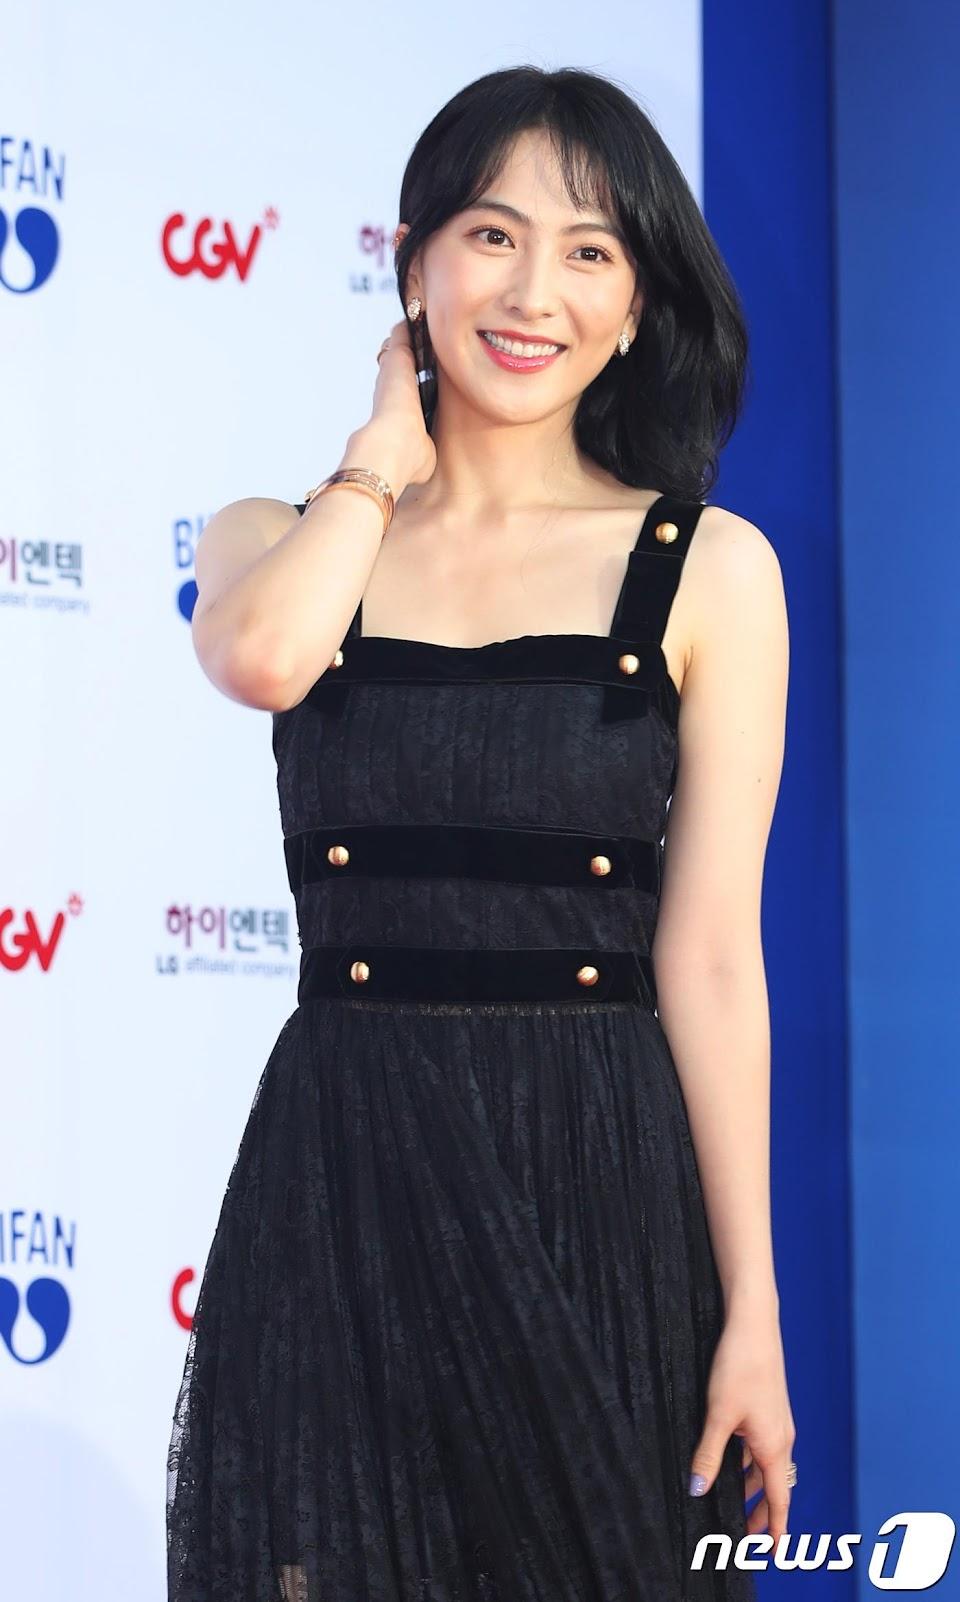 jiyoung 3